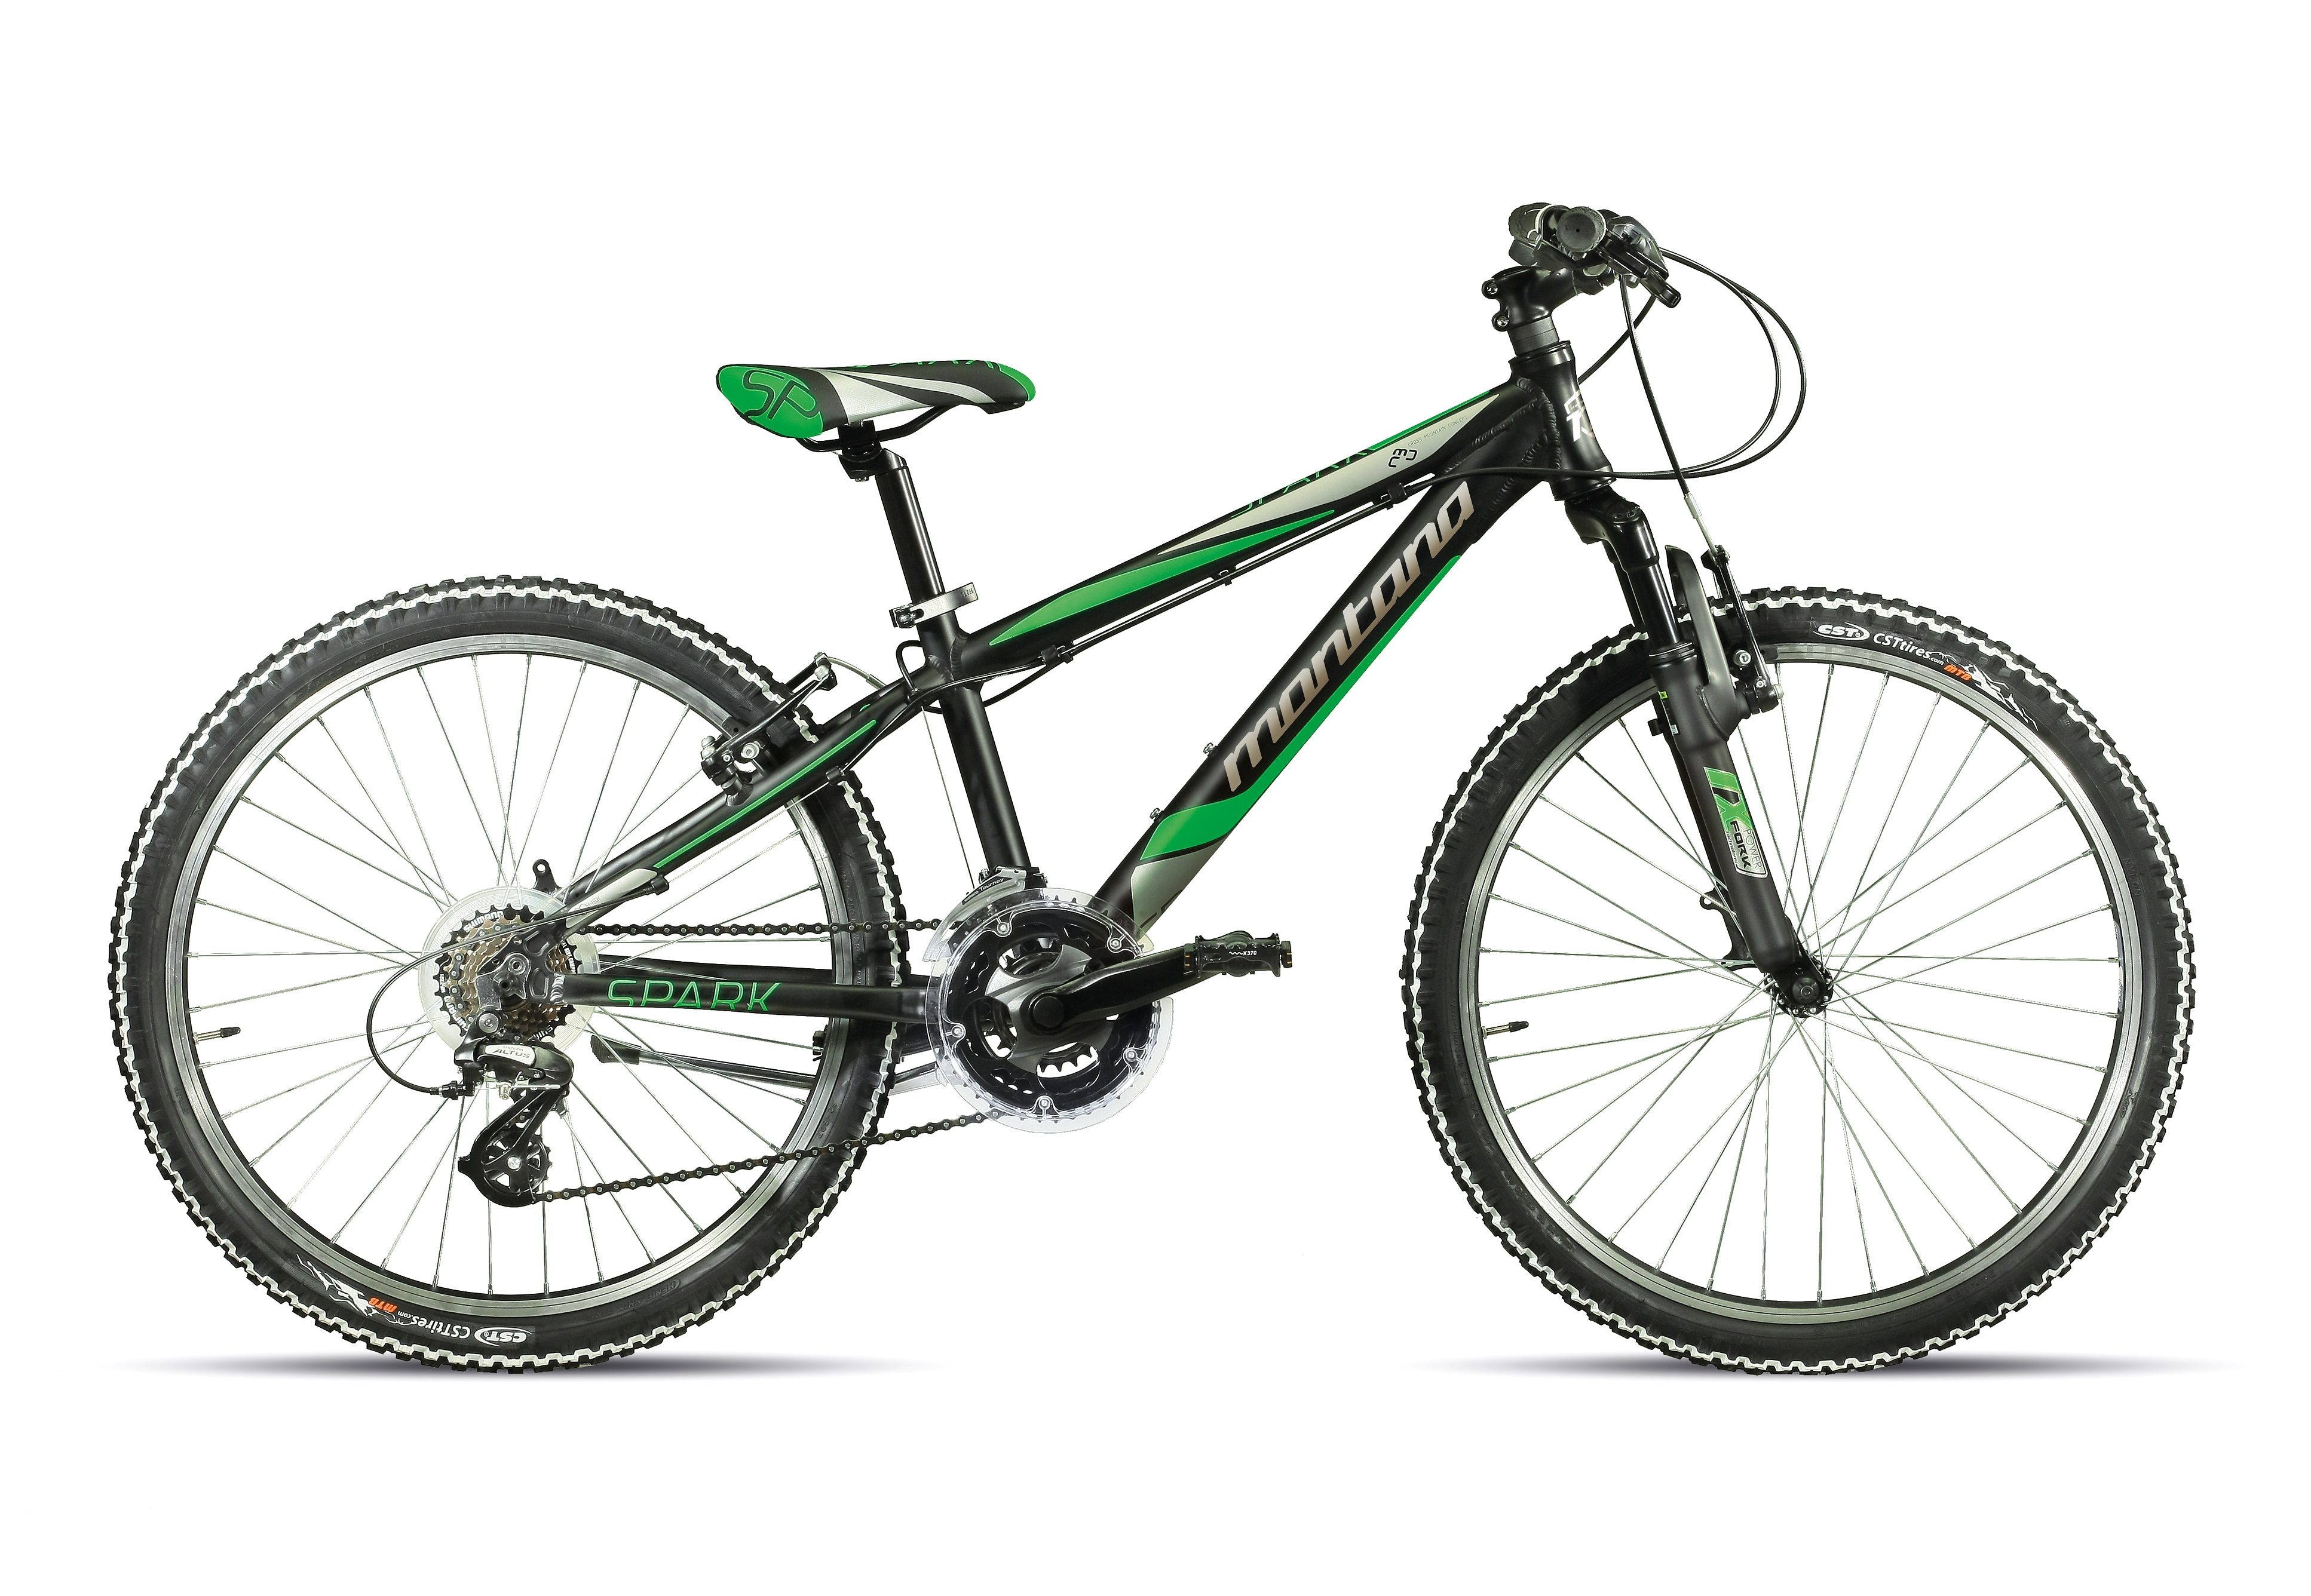 Jugendfahrrad MTB, 24 Zoll, schwarz-grün-grau, 21 Gang Shimano, »Spidy H 924-S«, Montana